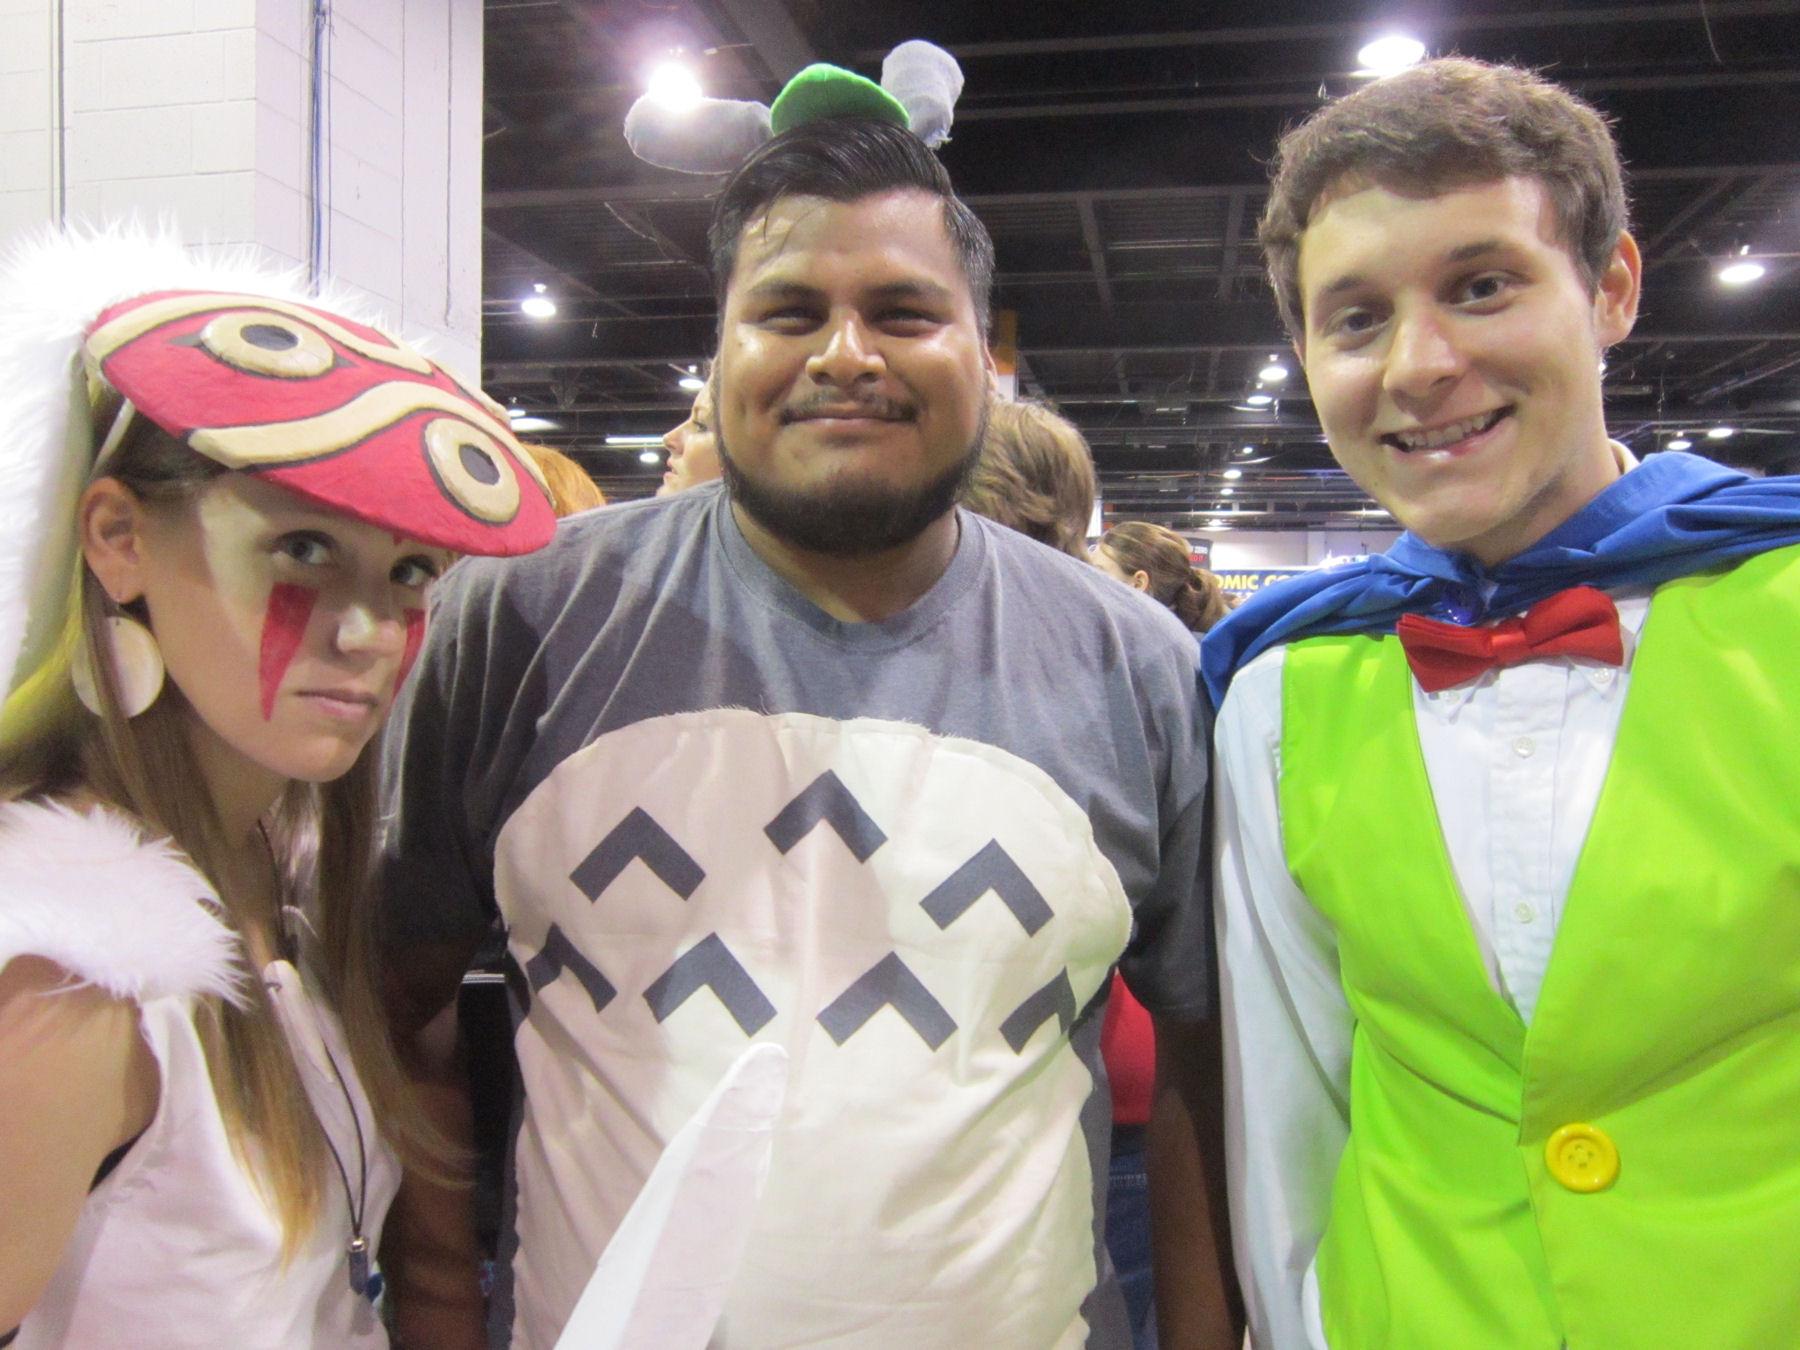 Wizard World Chicago 2015 Photos Part 1 Of 7 Team Cosplay